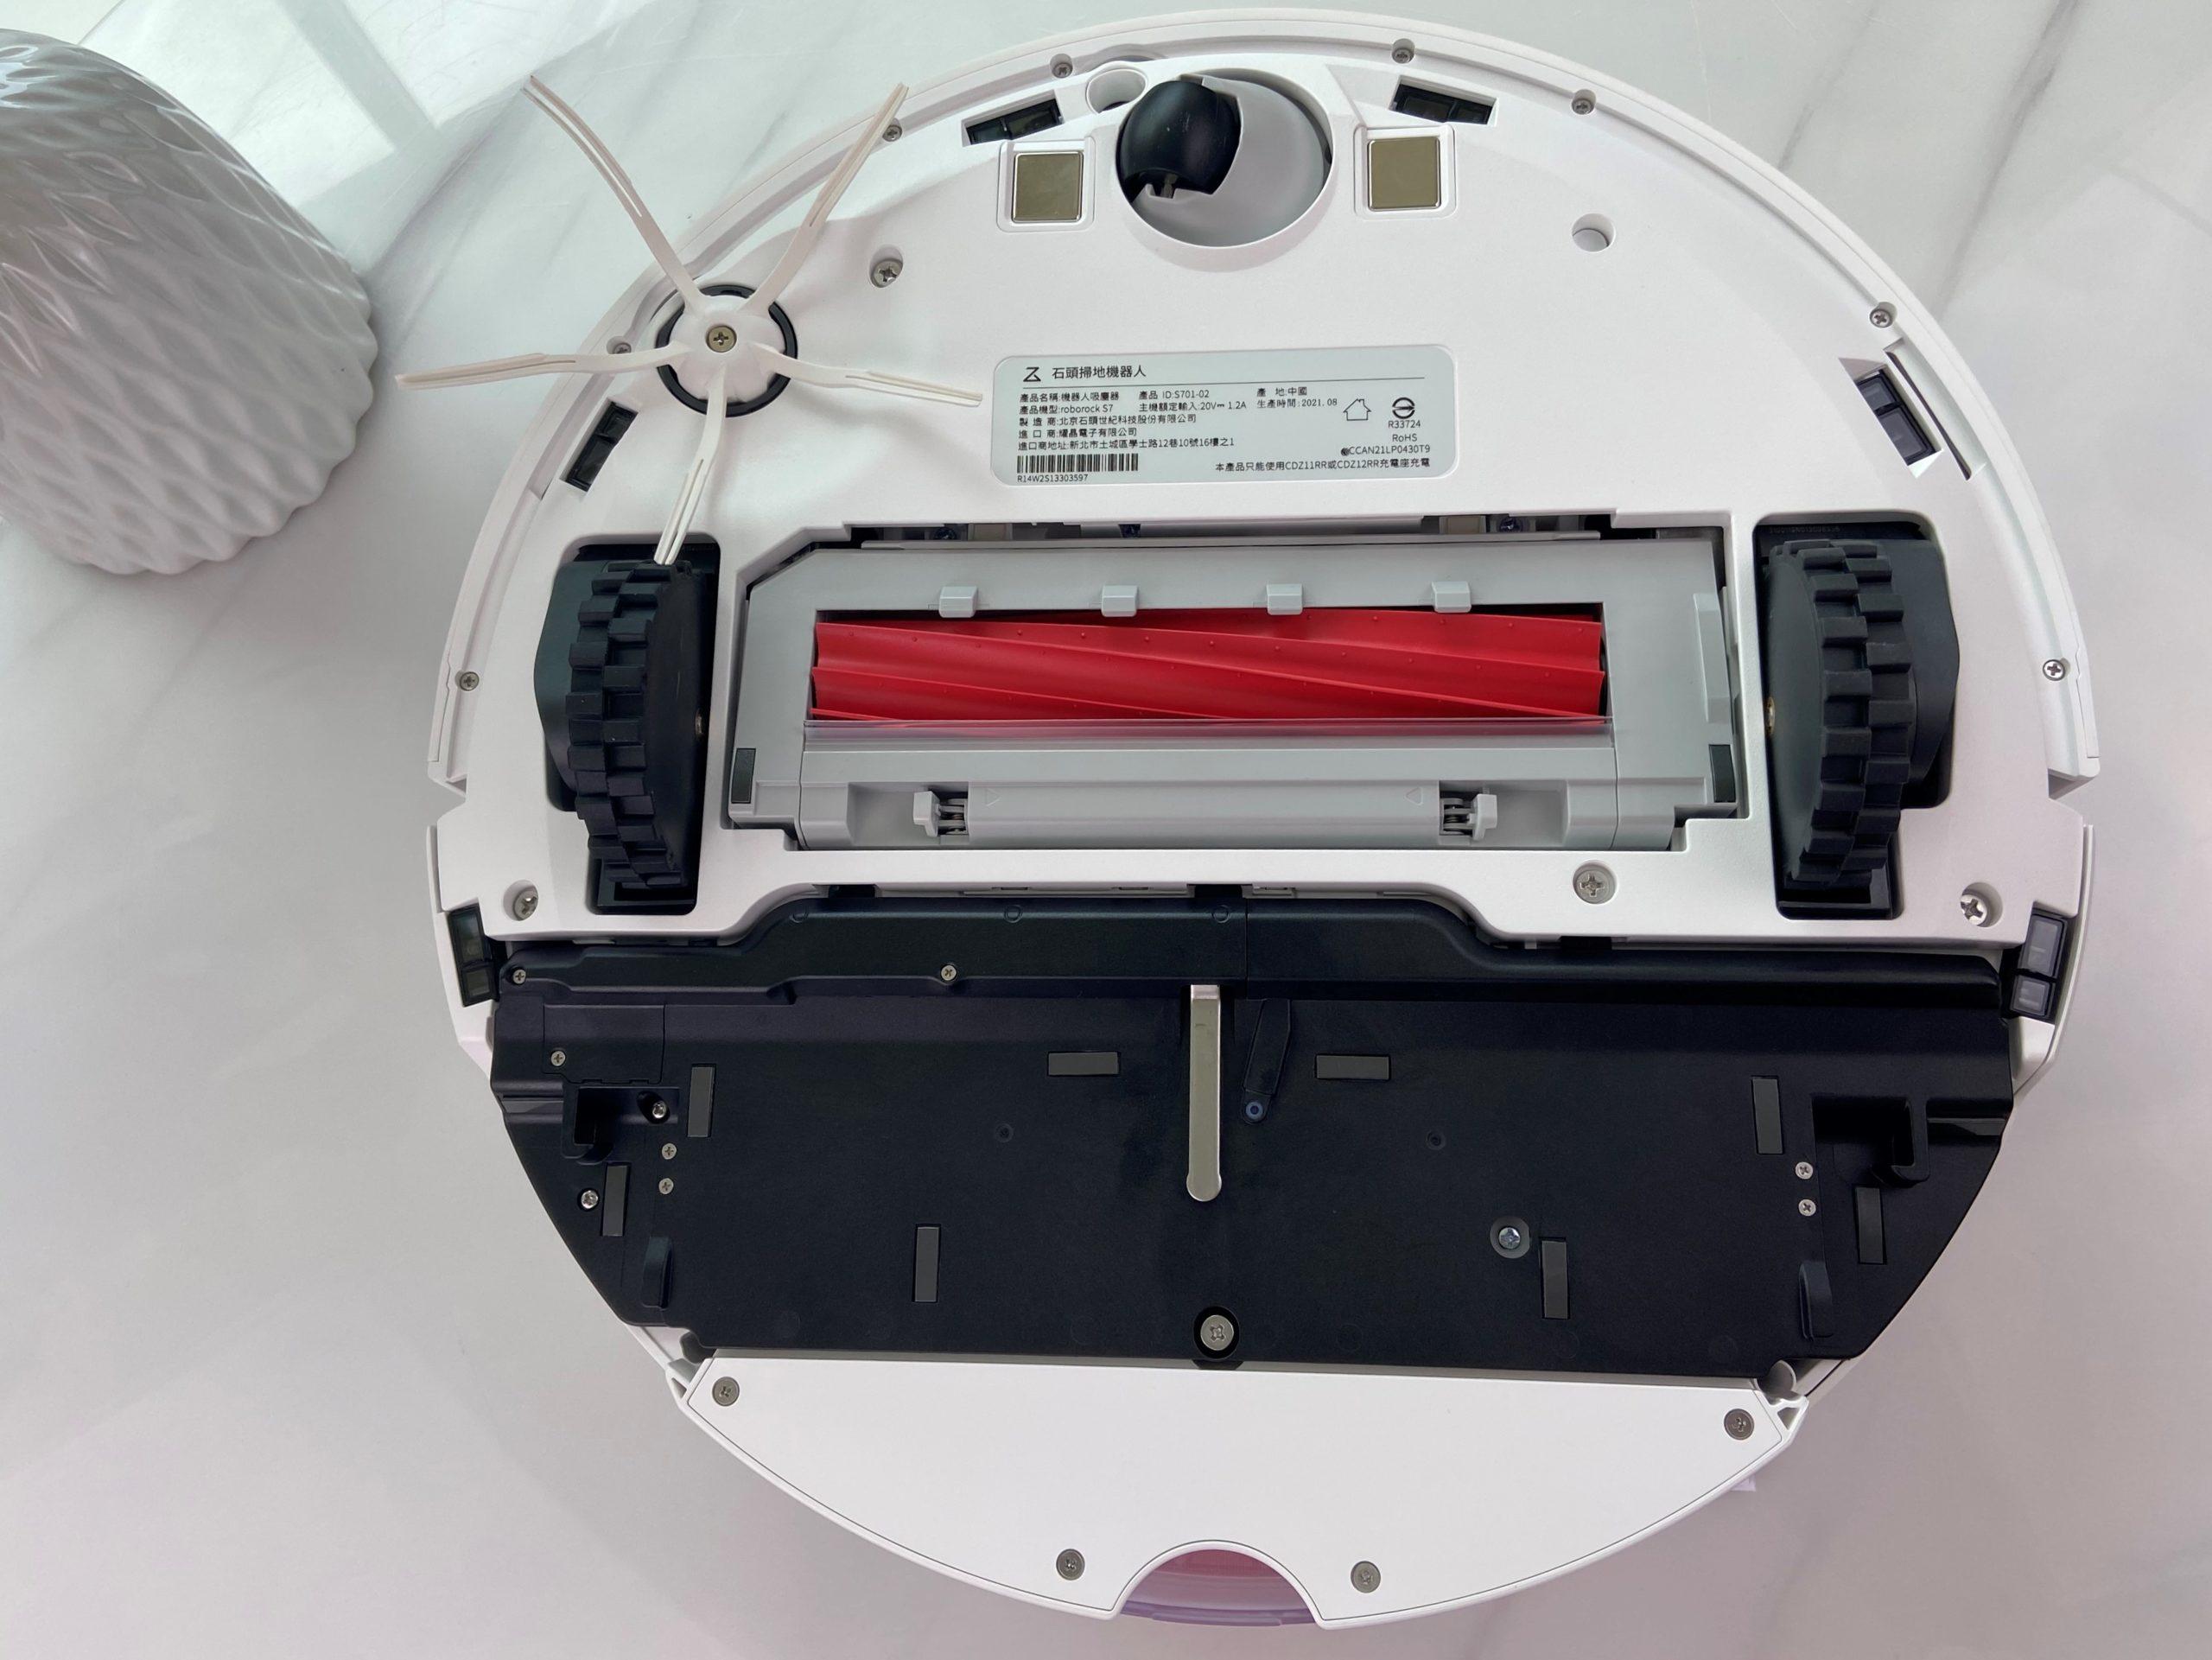 Roborock S7 石頭掃拖機器人 內部構造